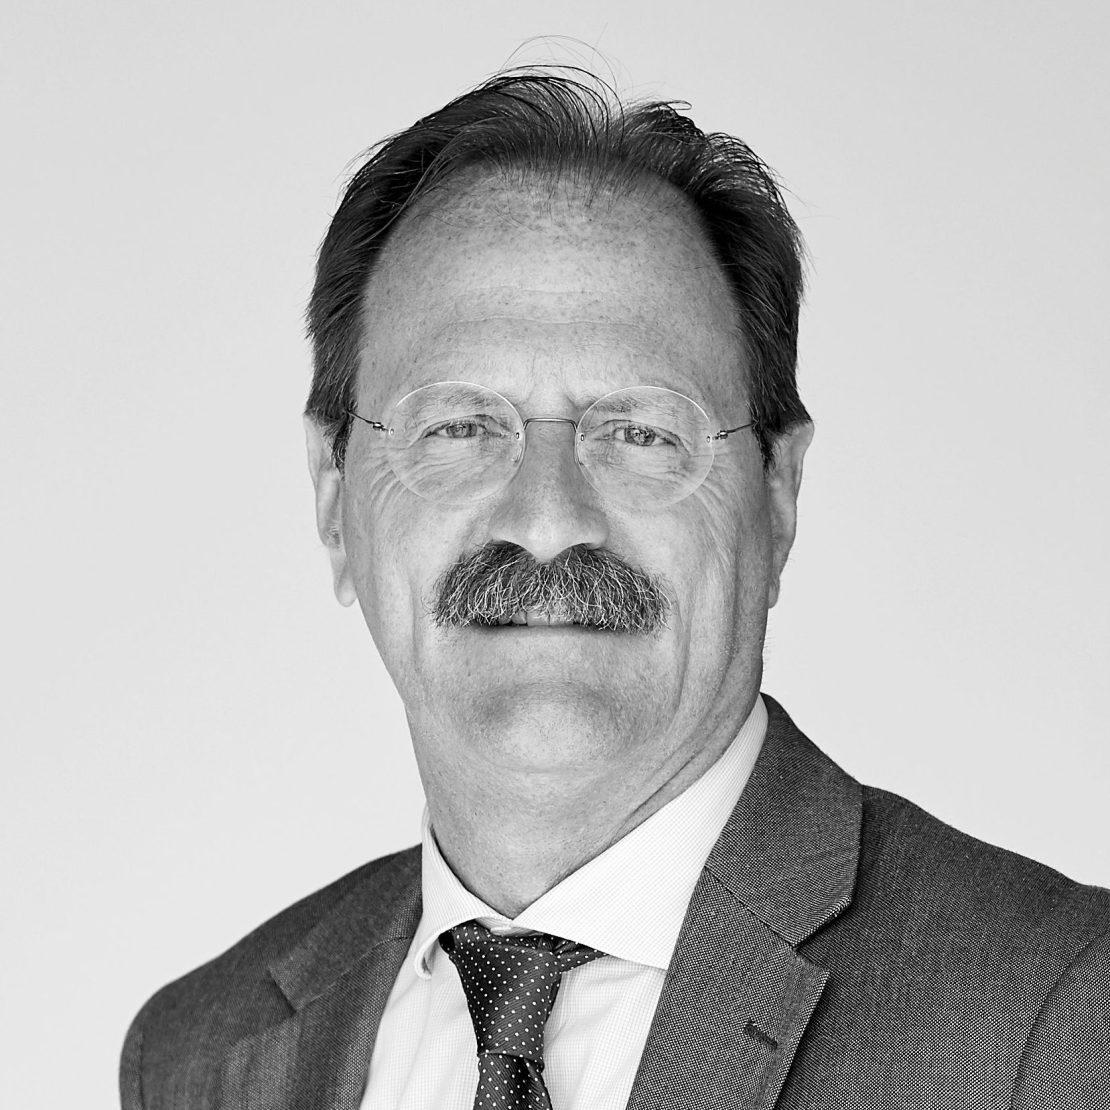 Alberto Piaggesi, MD